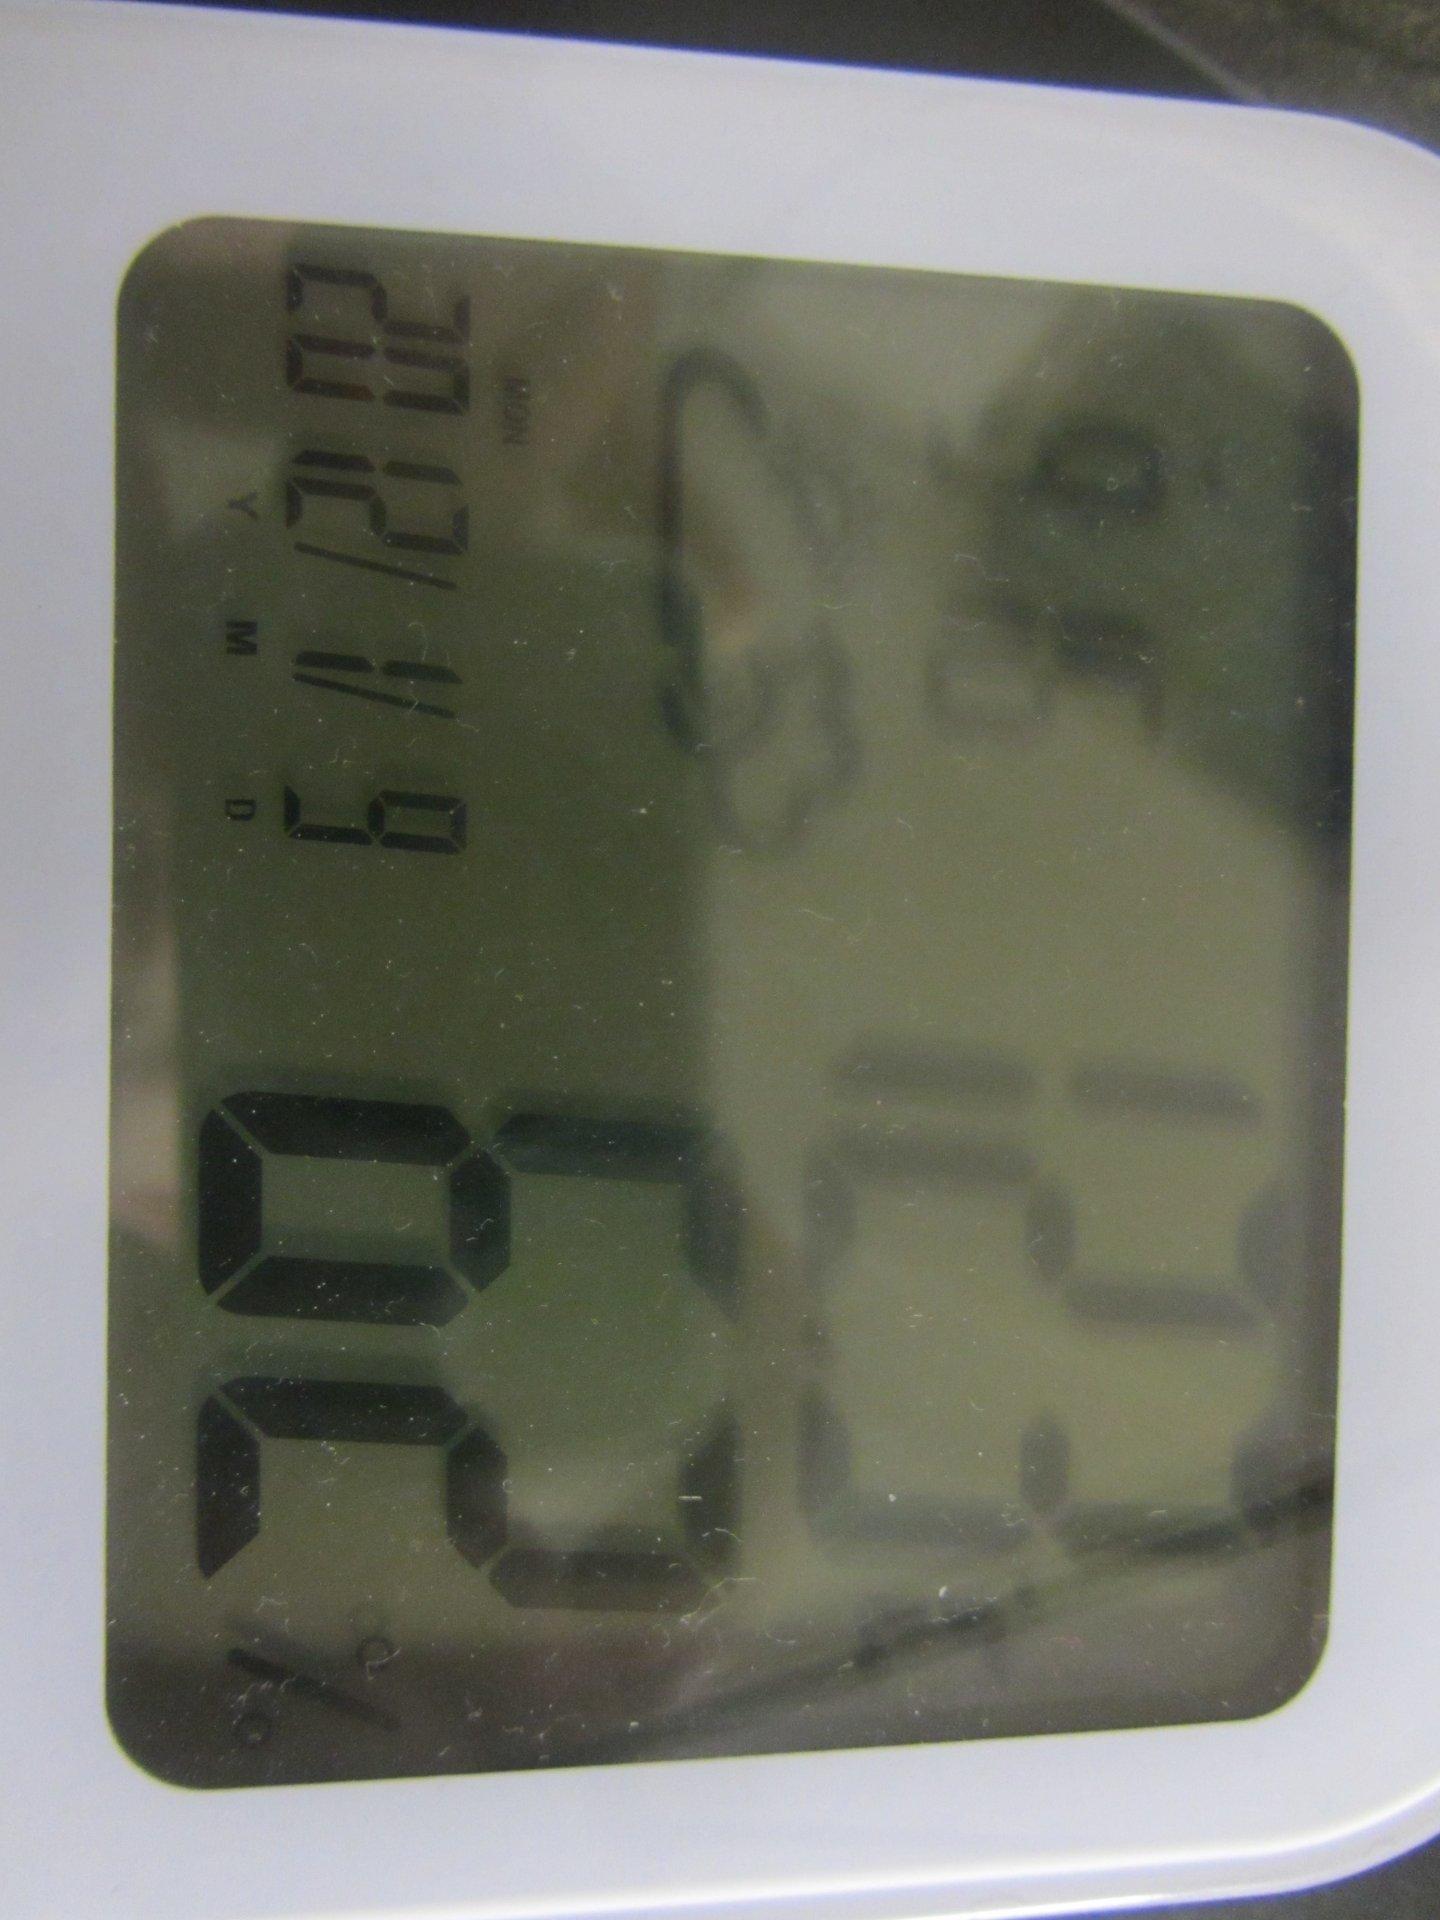 Bild10 Wetterstation.JPG